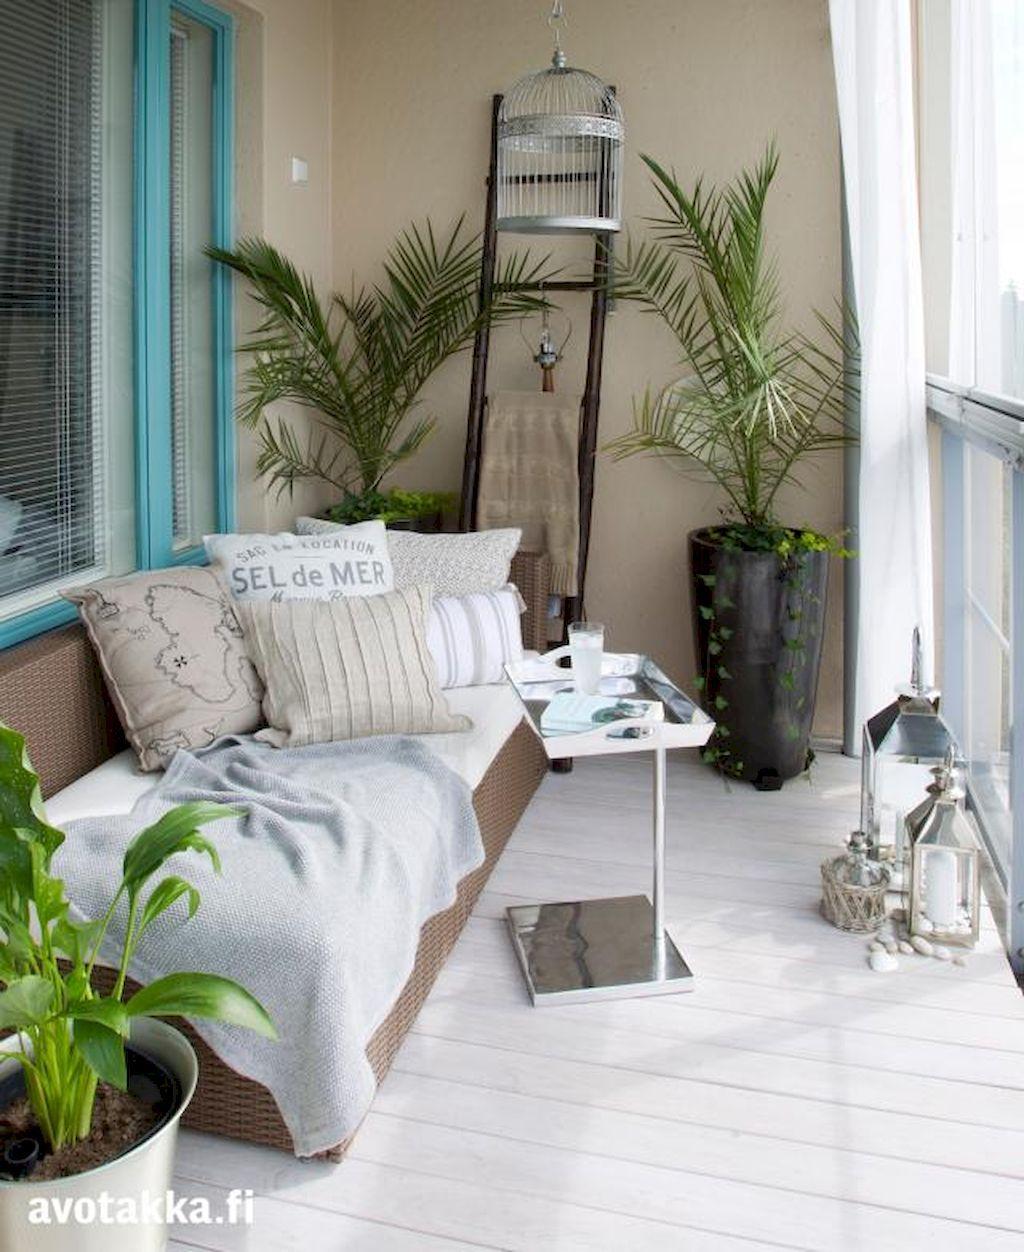 63 Cozy Apartment Balcony Decorating Ideas: Pin By Dilek Izmirliyan On Decoration